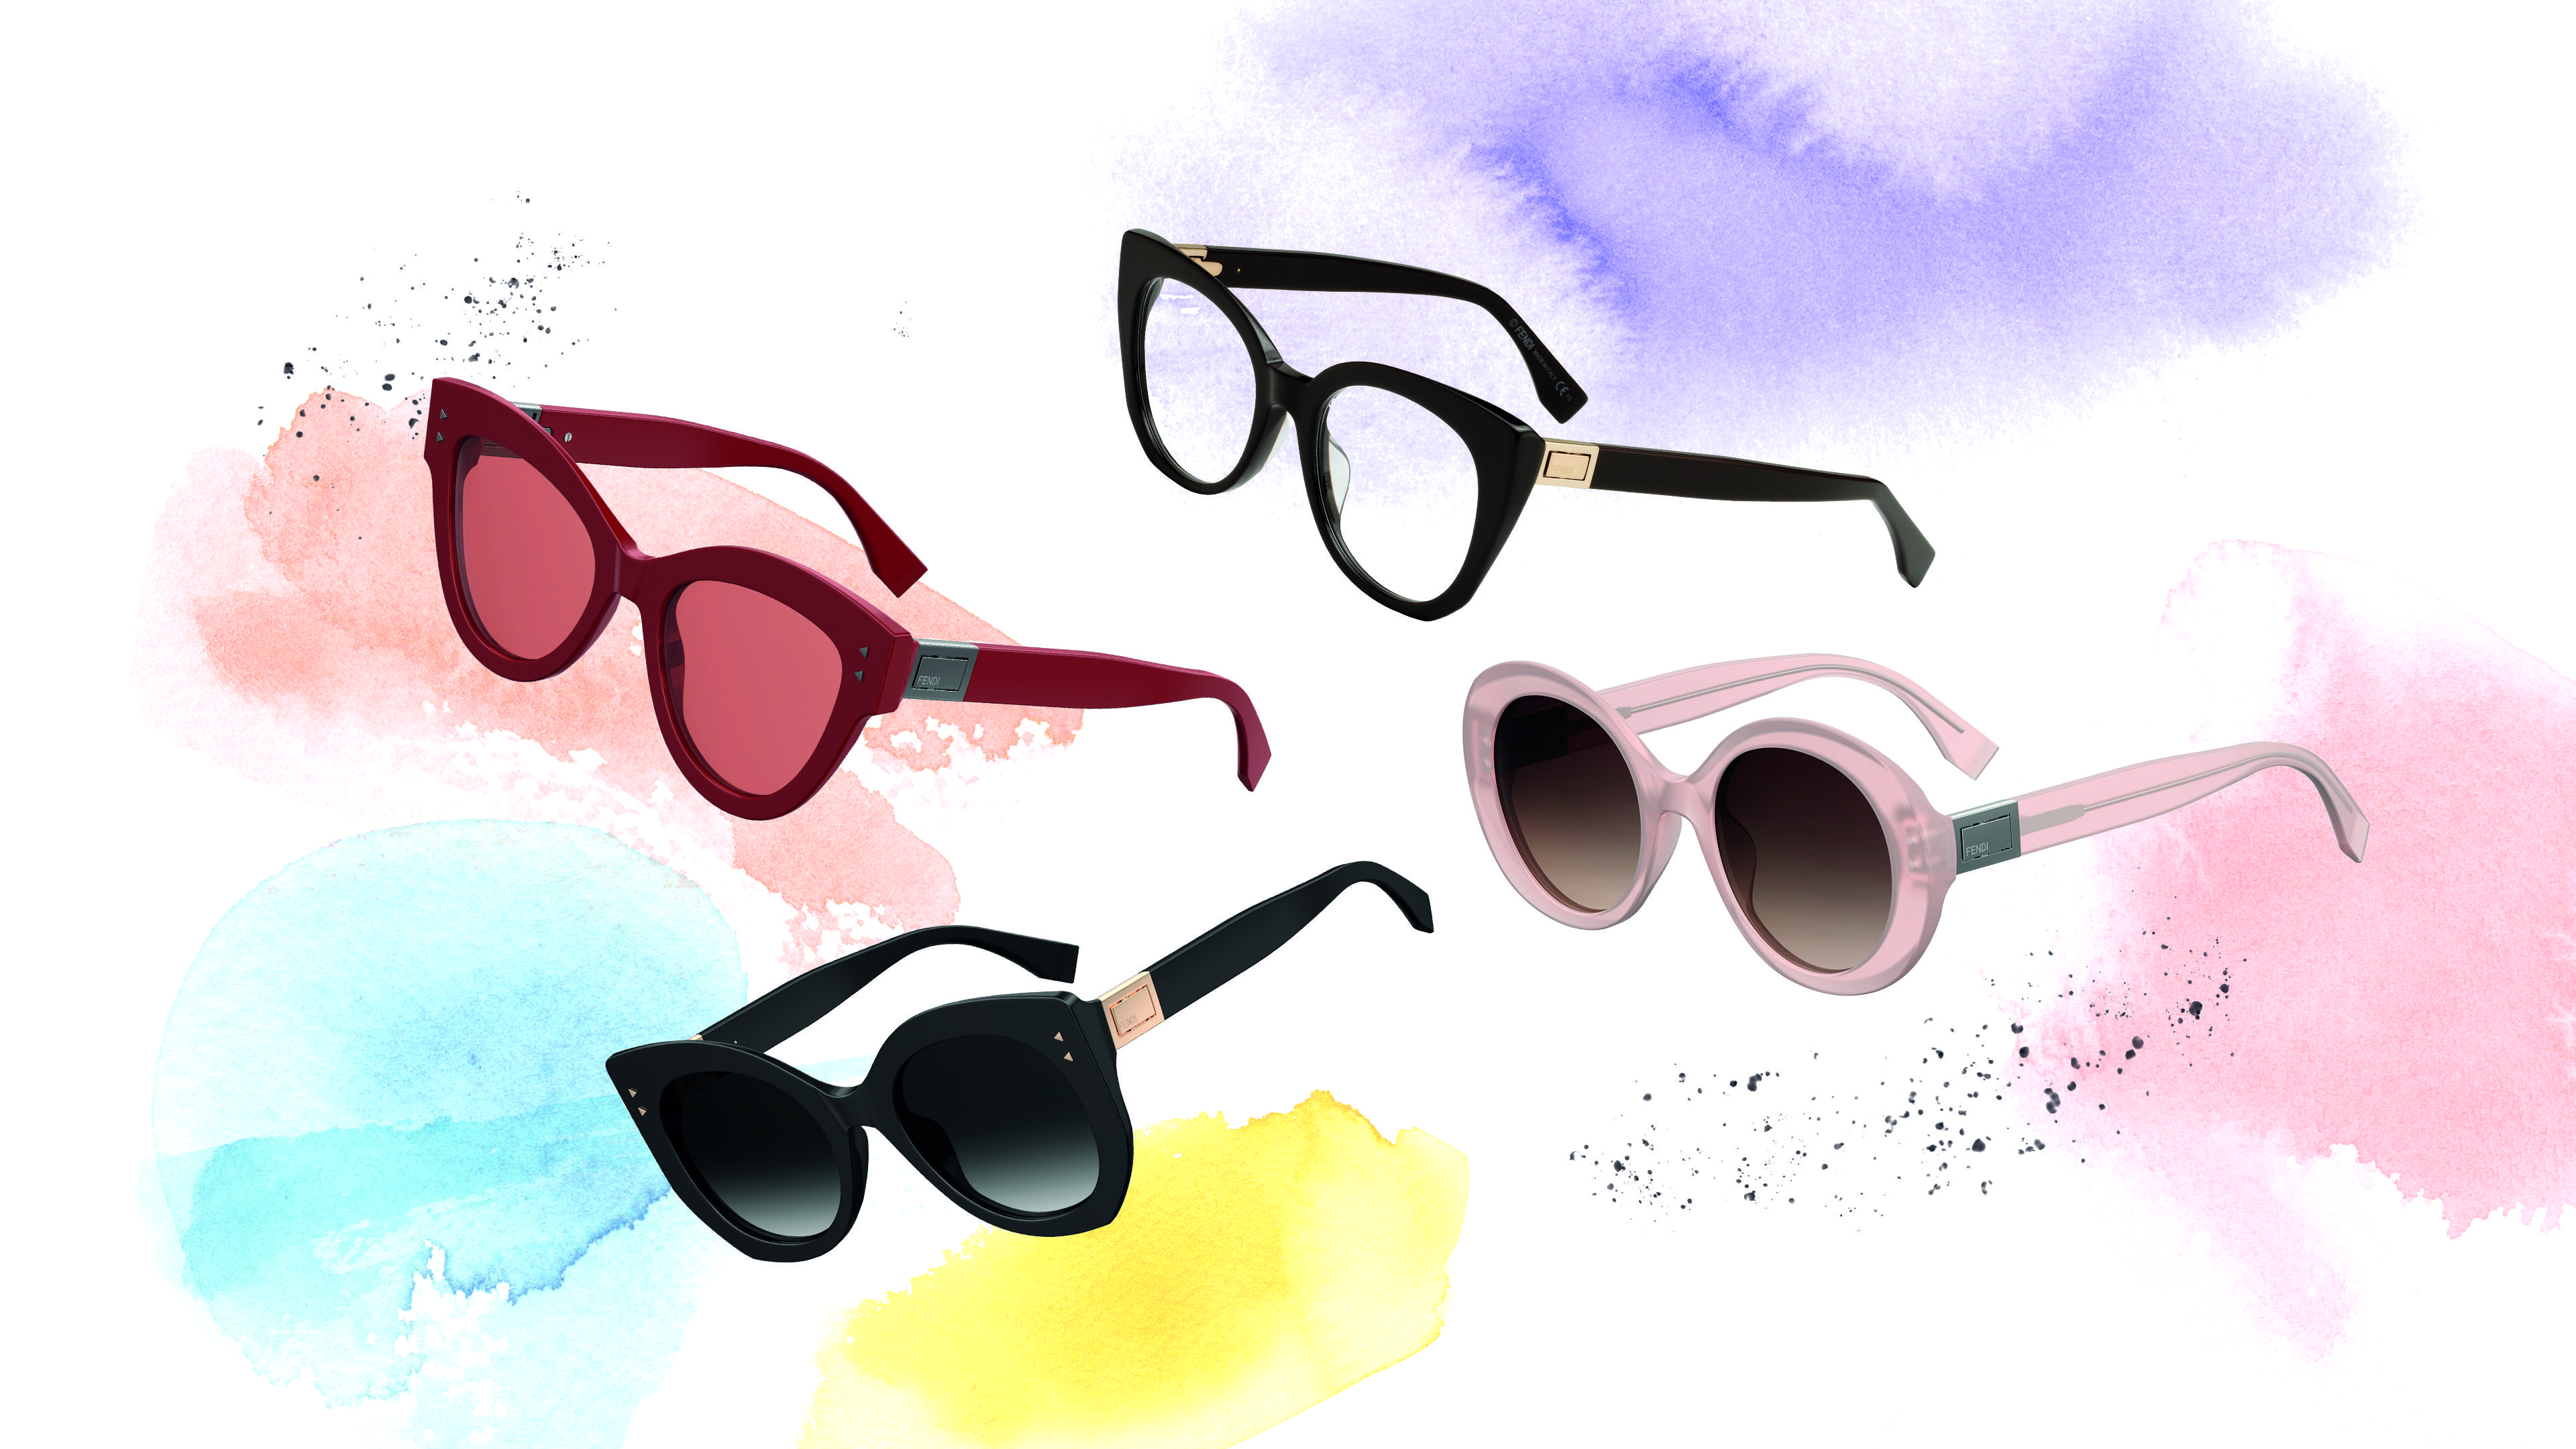 cc059e7593 Fendi Peekaboo Eyewear designes inspired from the iconic bag. Find more on  Fendi.com